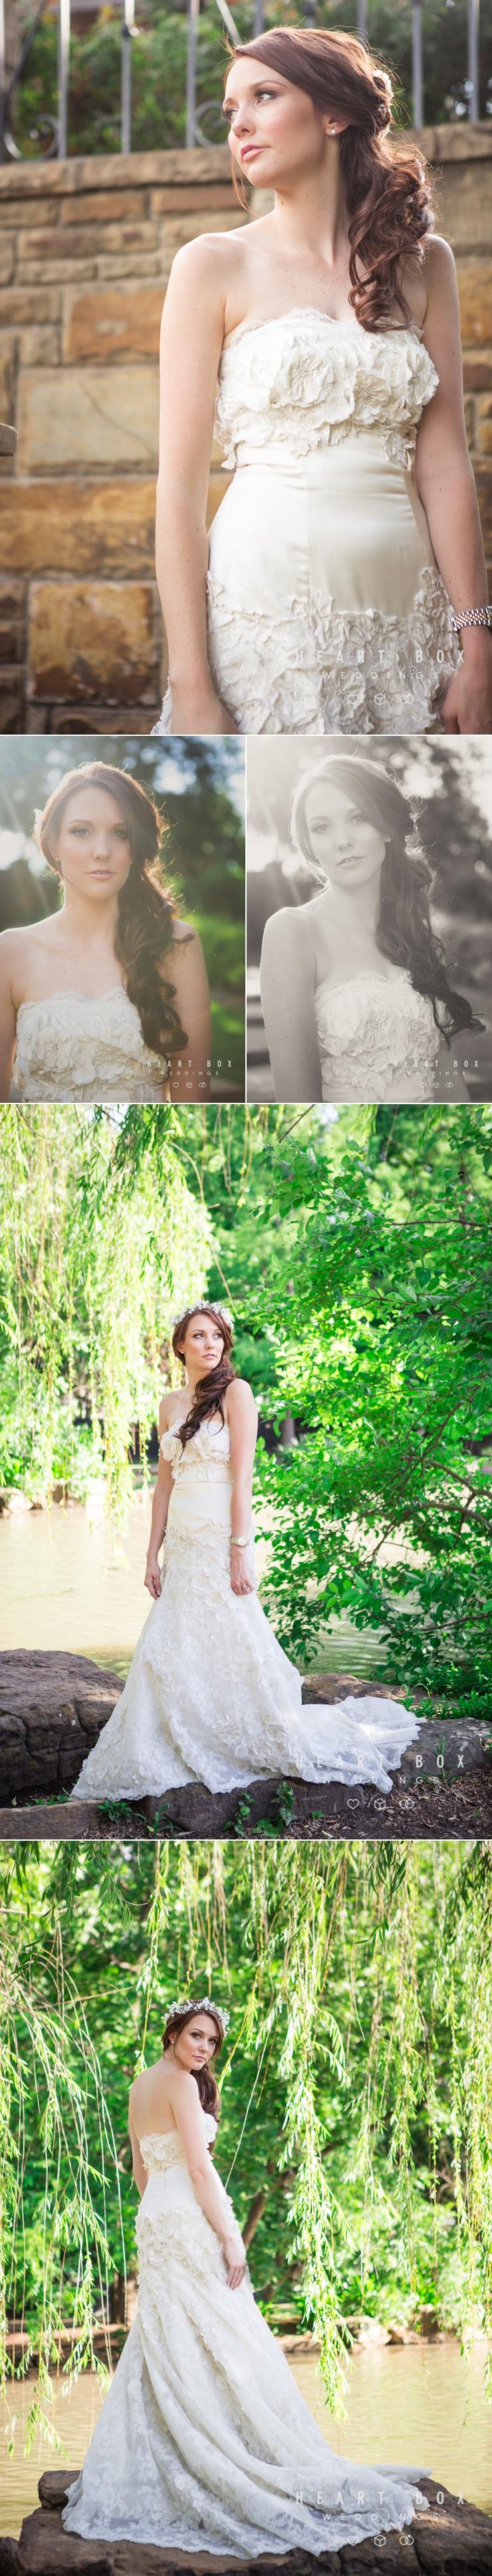 Botanic Gardens Bridal Session